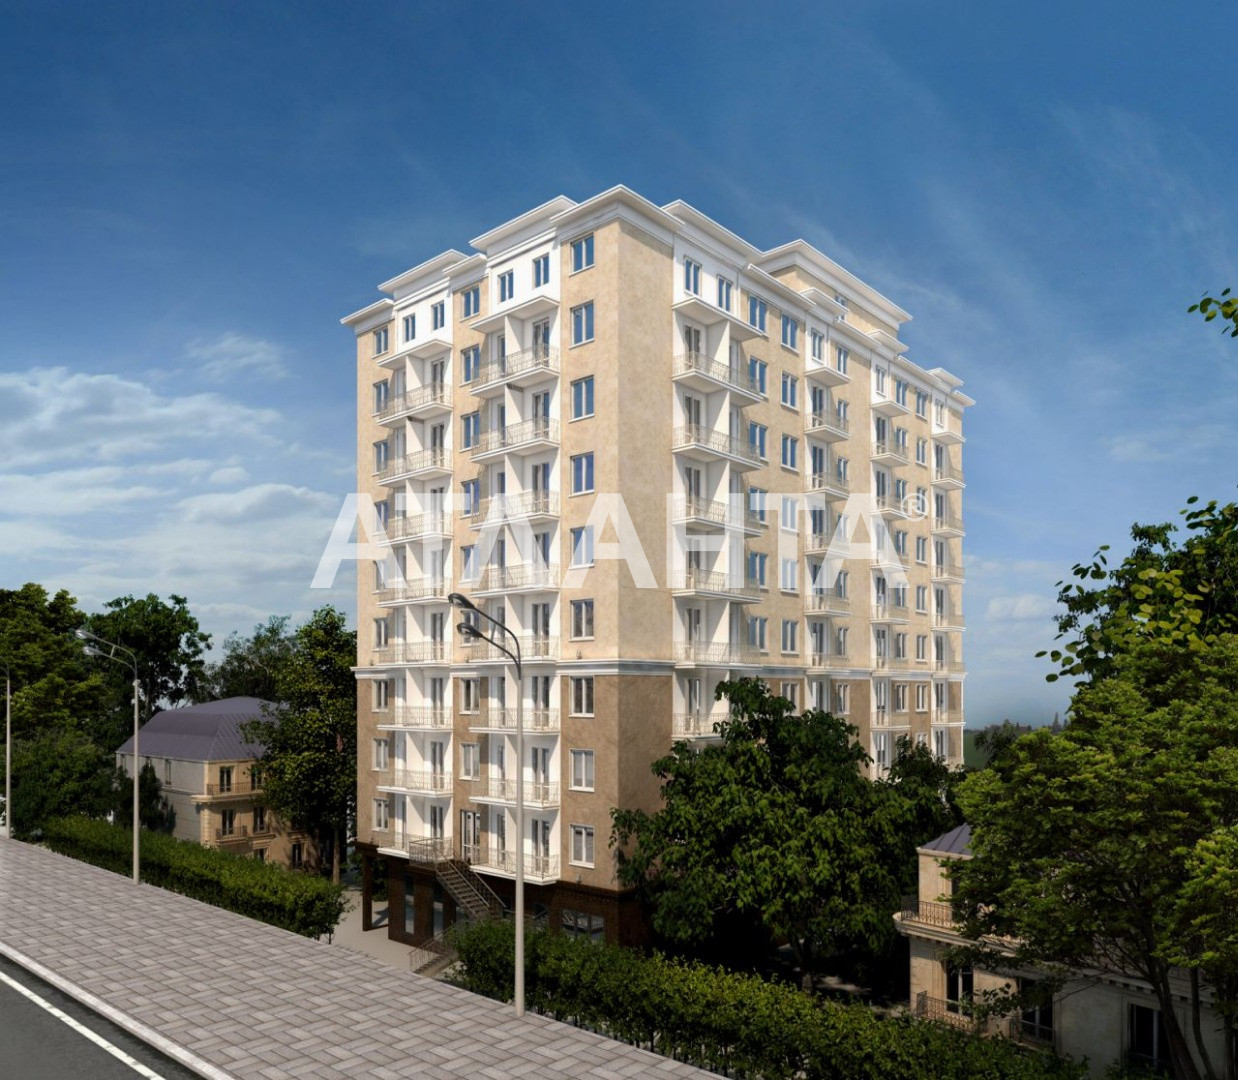 Продается 2-комнатная Квартира на ул. Балковская (Фрунзе) — 45 820 у.е. (фото №4)